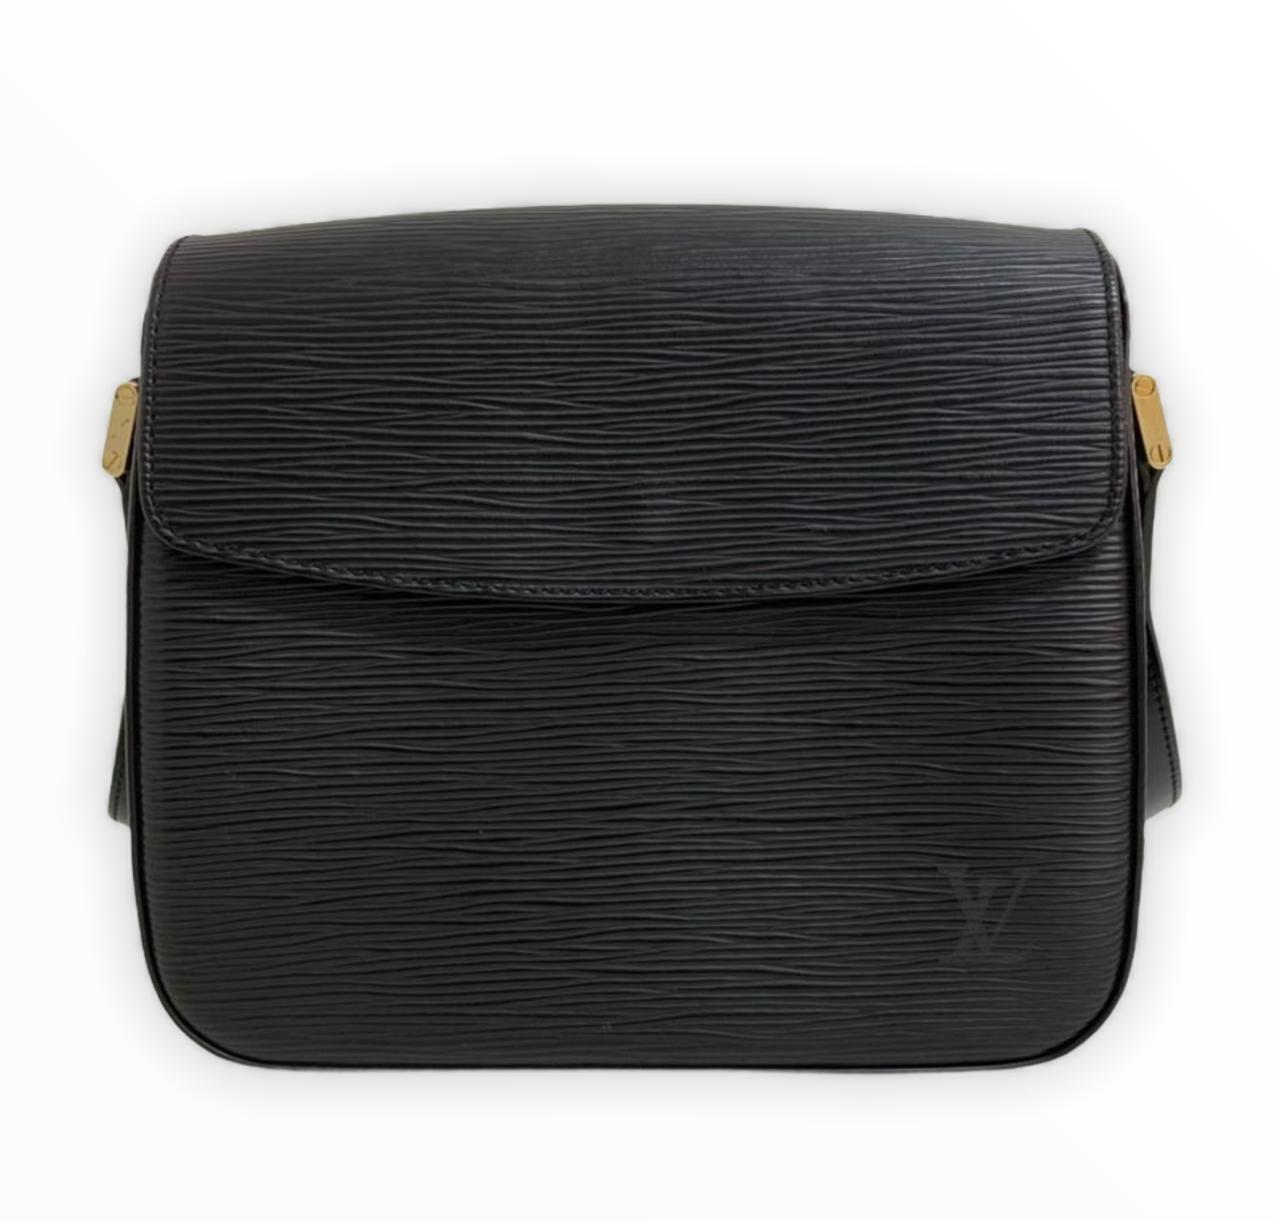 Bolsa Louis Vuitton Epi Preta Shoulder